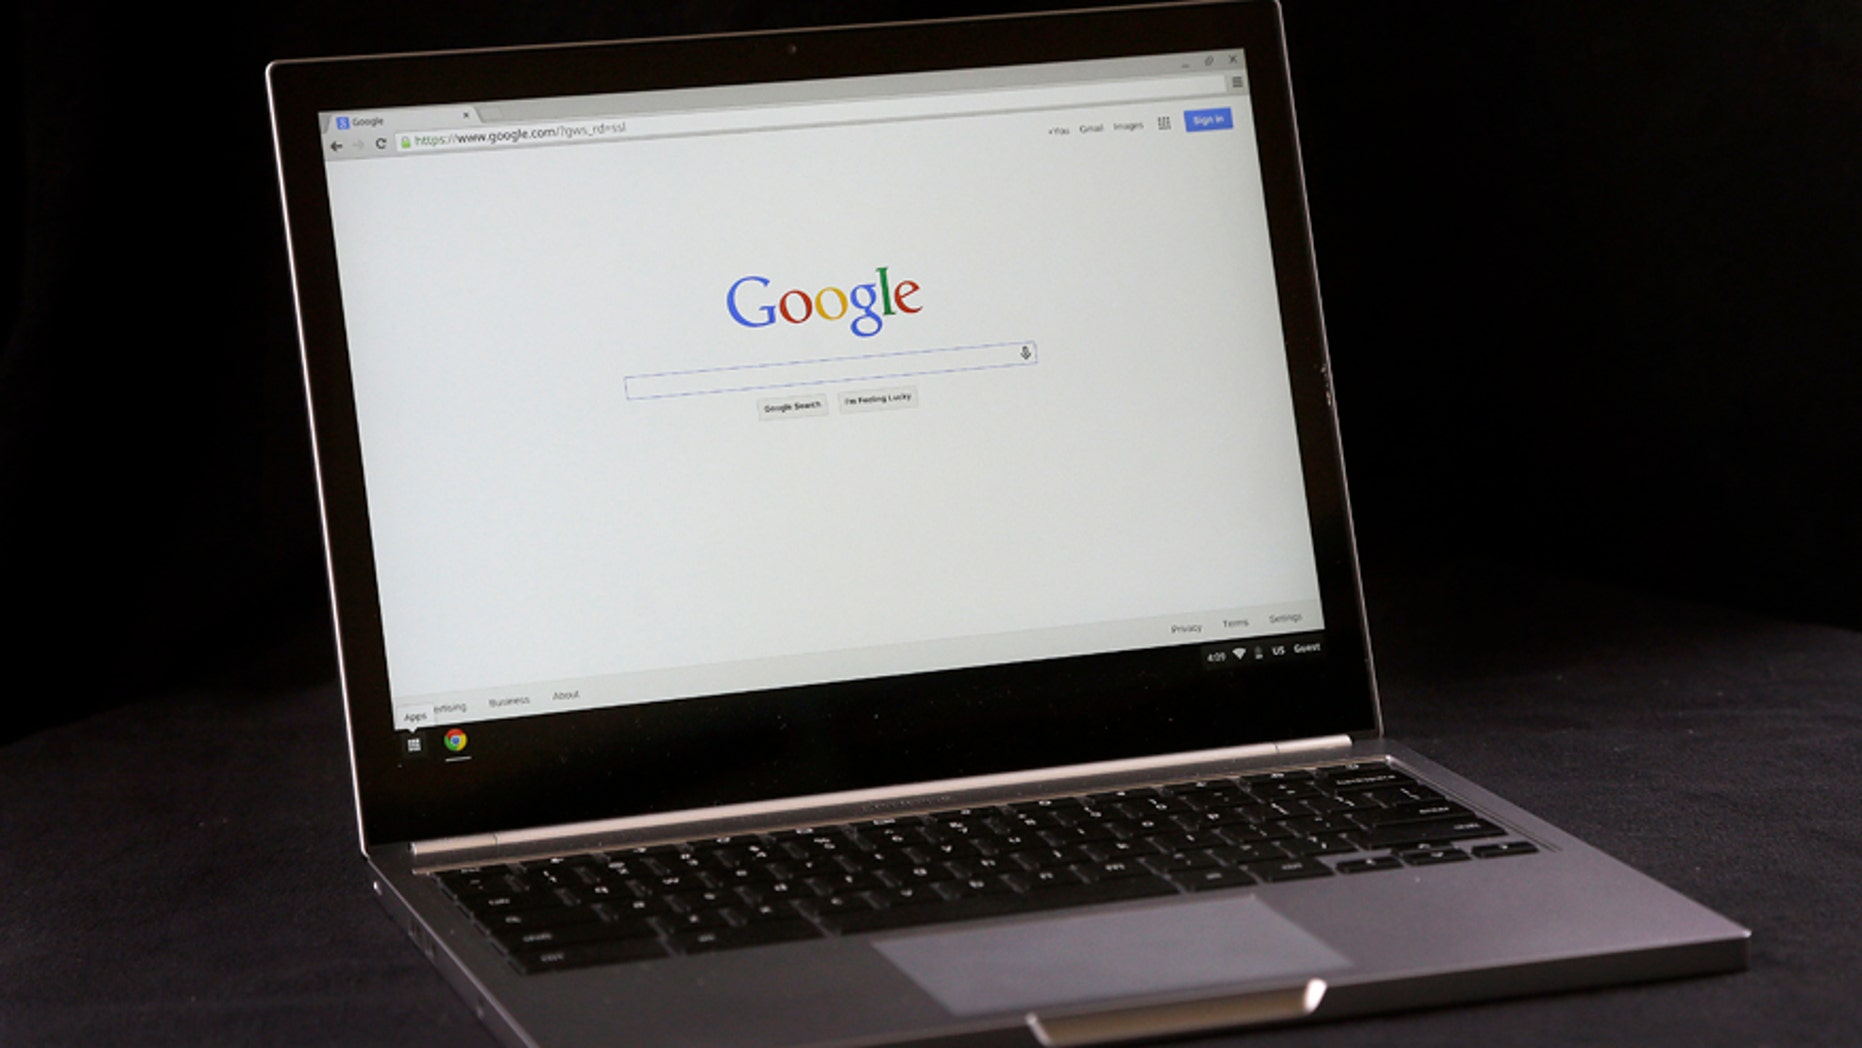 Googlechromebookap Ve Tl Black Friday Laptop Deals Include Google Microsoft